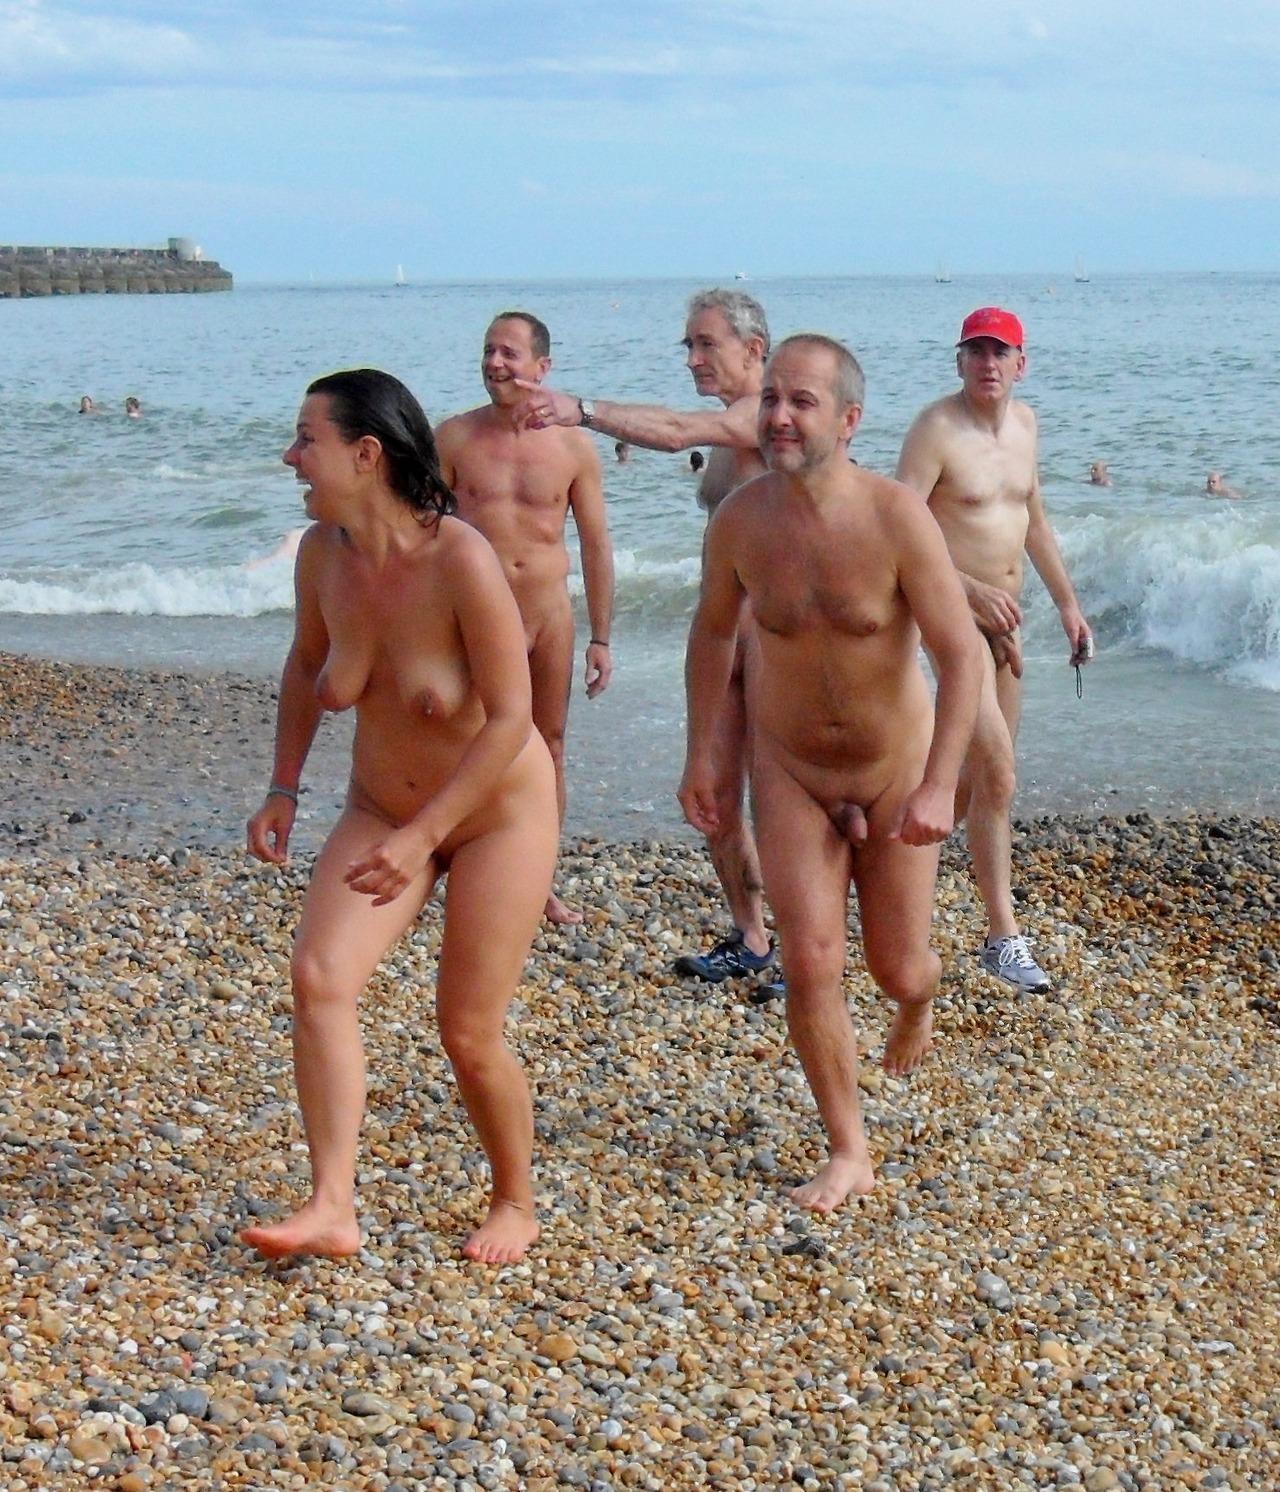 Naked photos sailing voyeur man